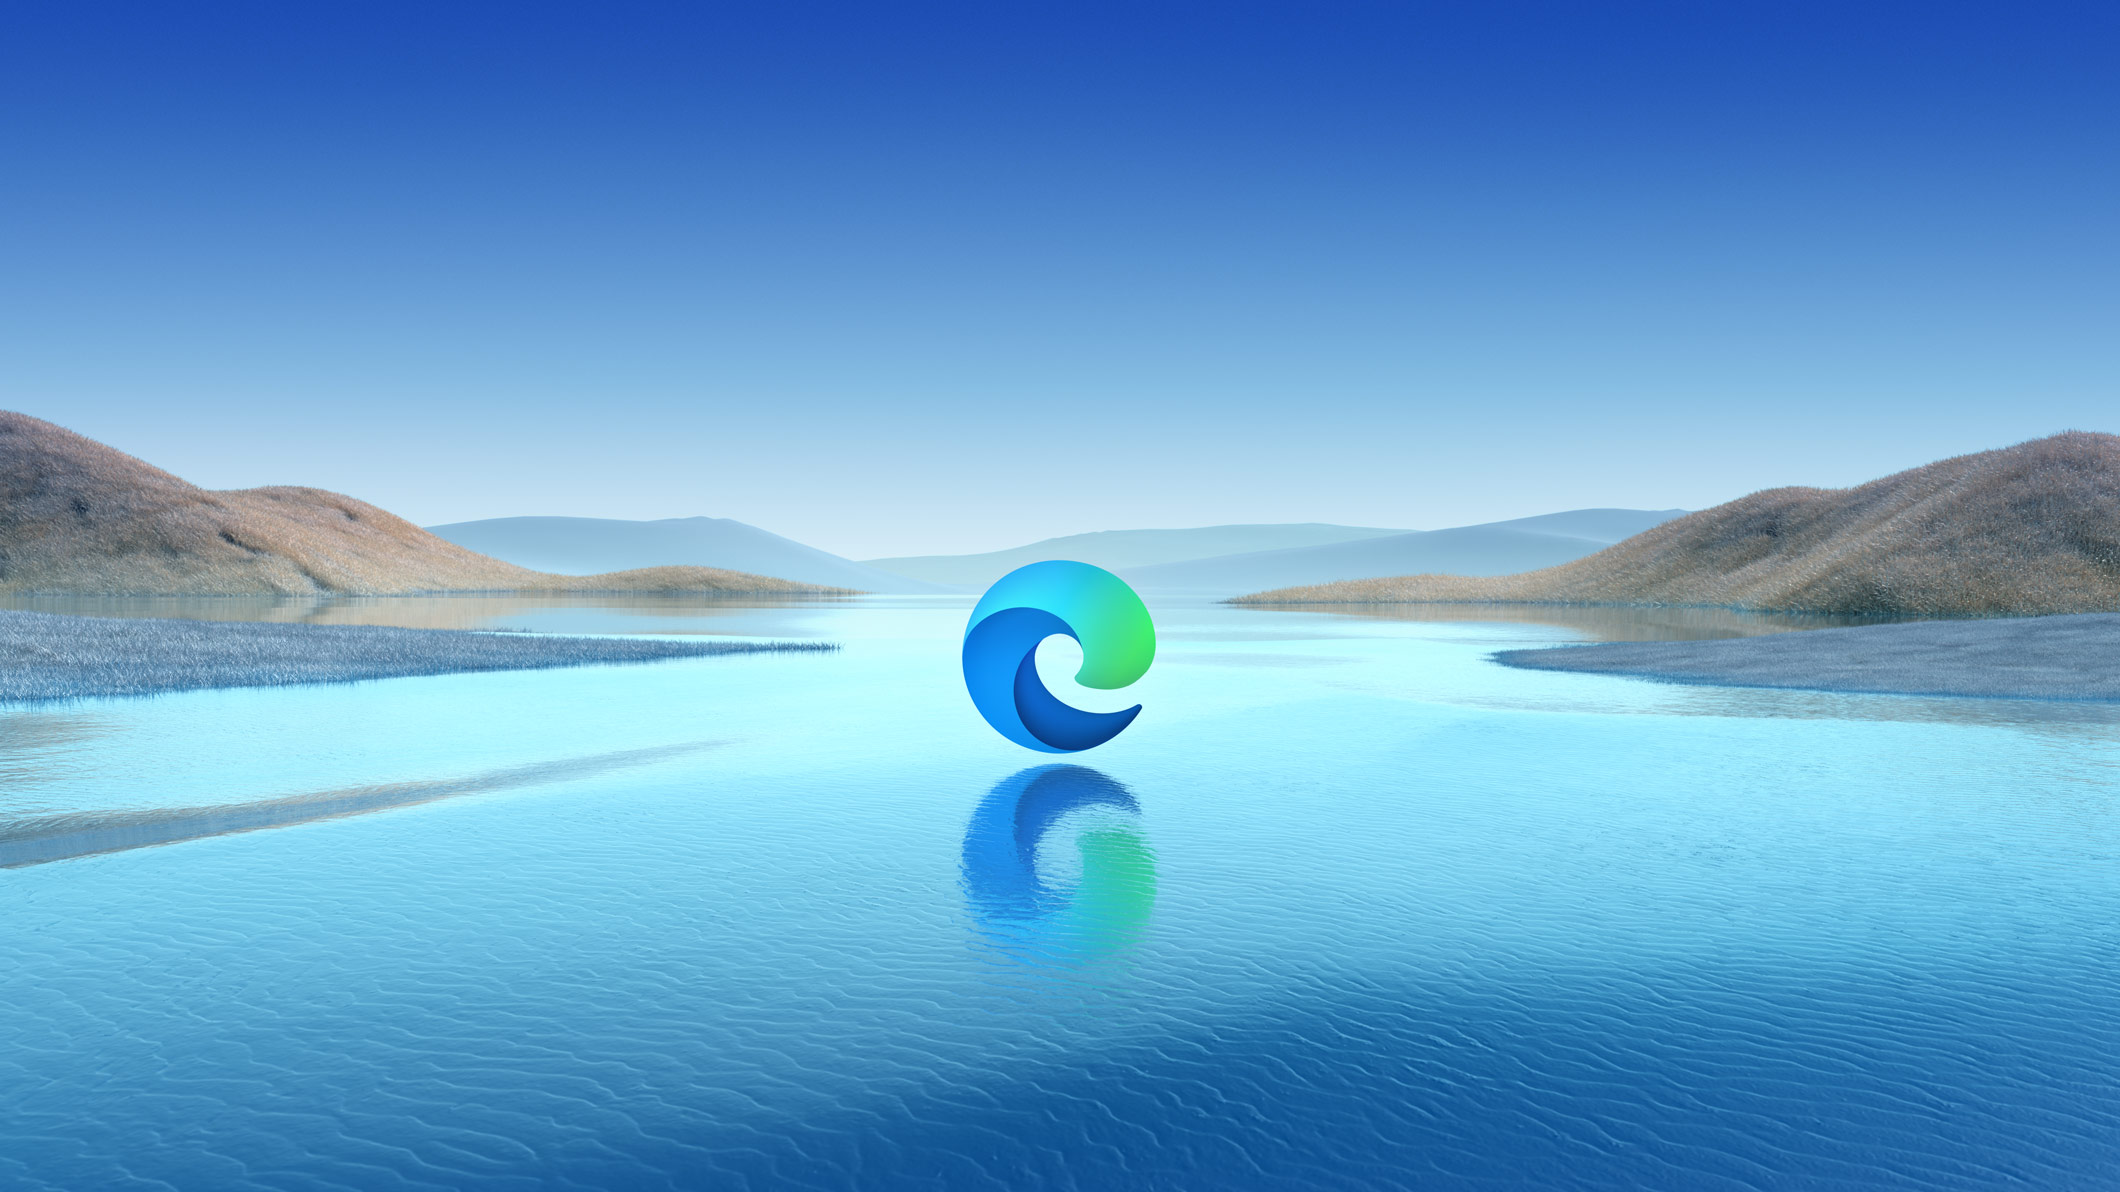 New Microsoft Edge icon with landscape background